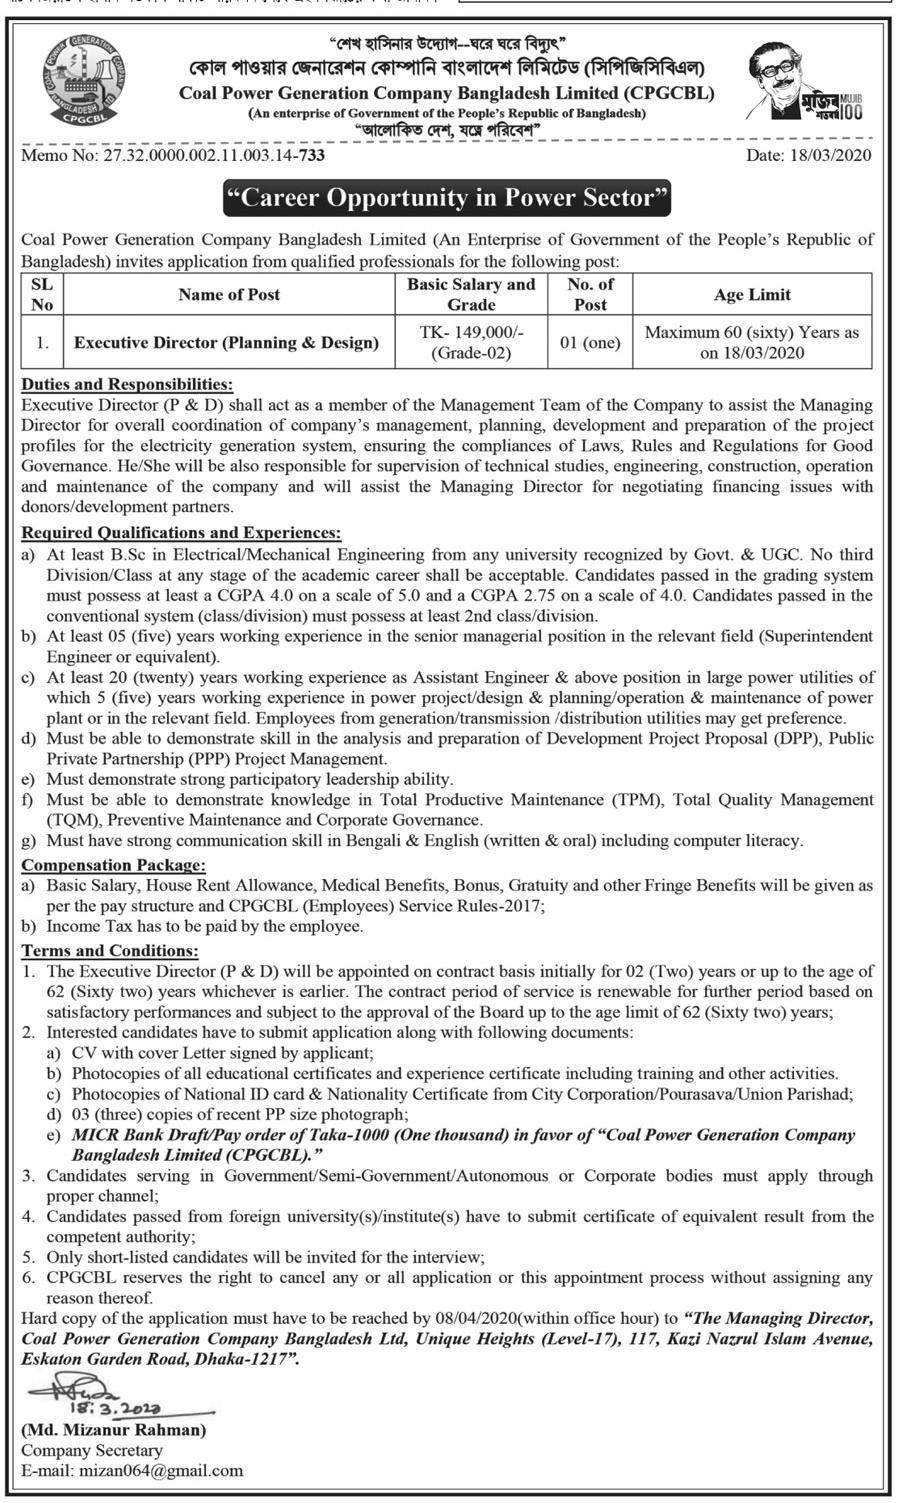 cpgcbl Job Circular 2020 || কোল পাওয়ার জেনারেশন বাংলাদেশ এর চাকরির নিয়োগ প্রকাশ